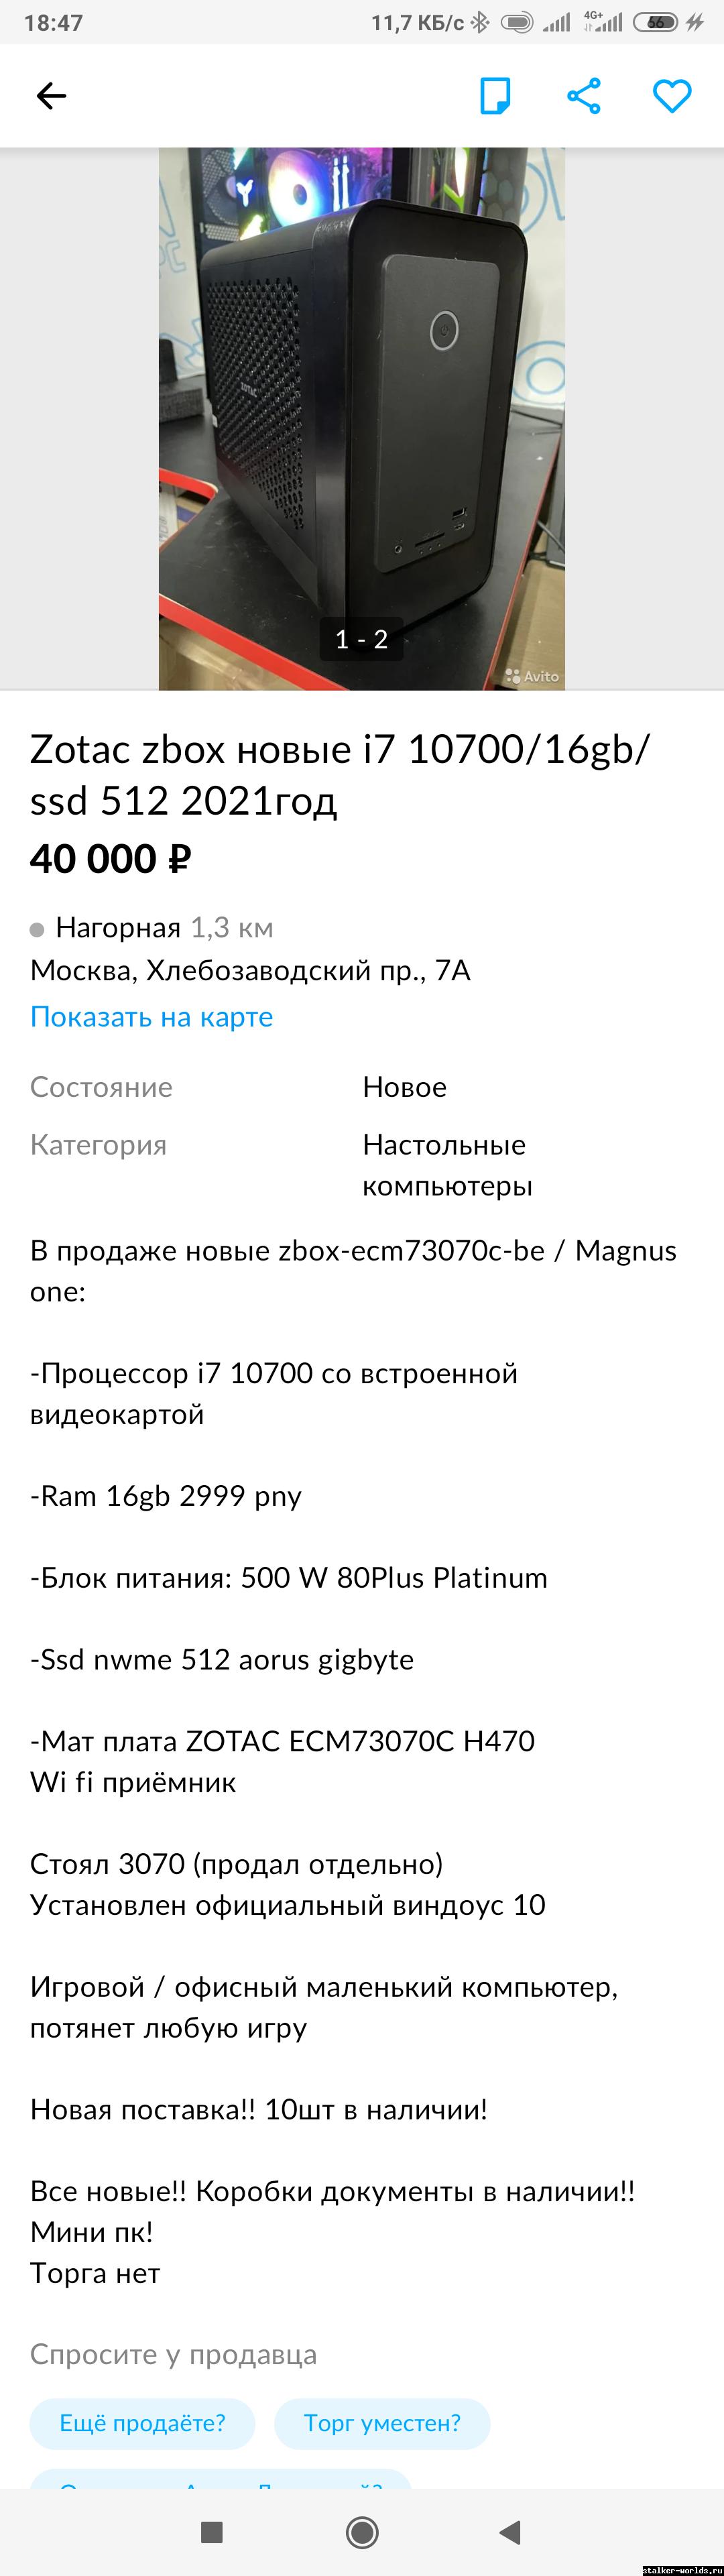 sw_1632412184__screenshot_2021-09-23-18-